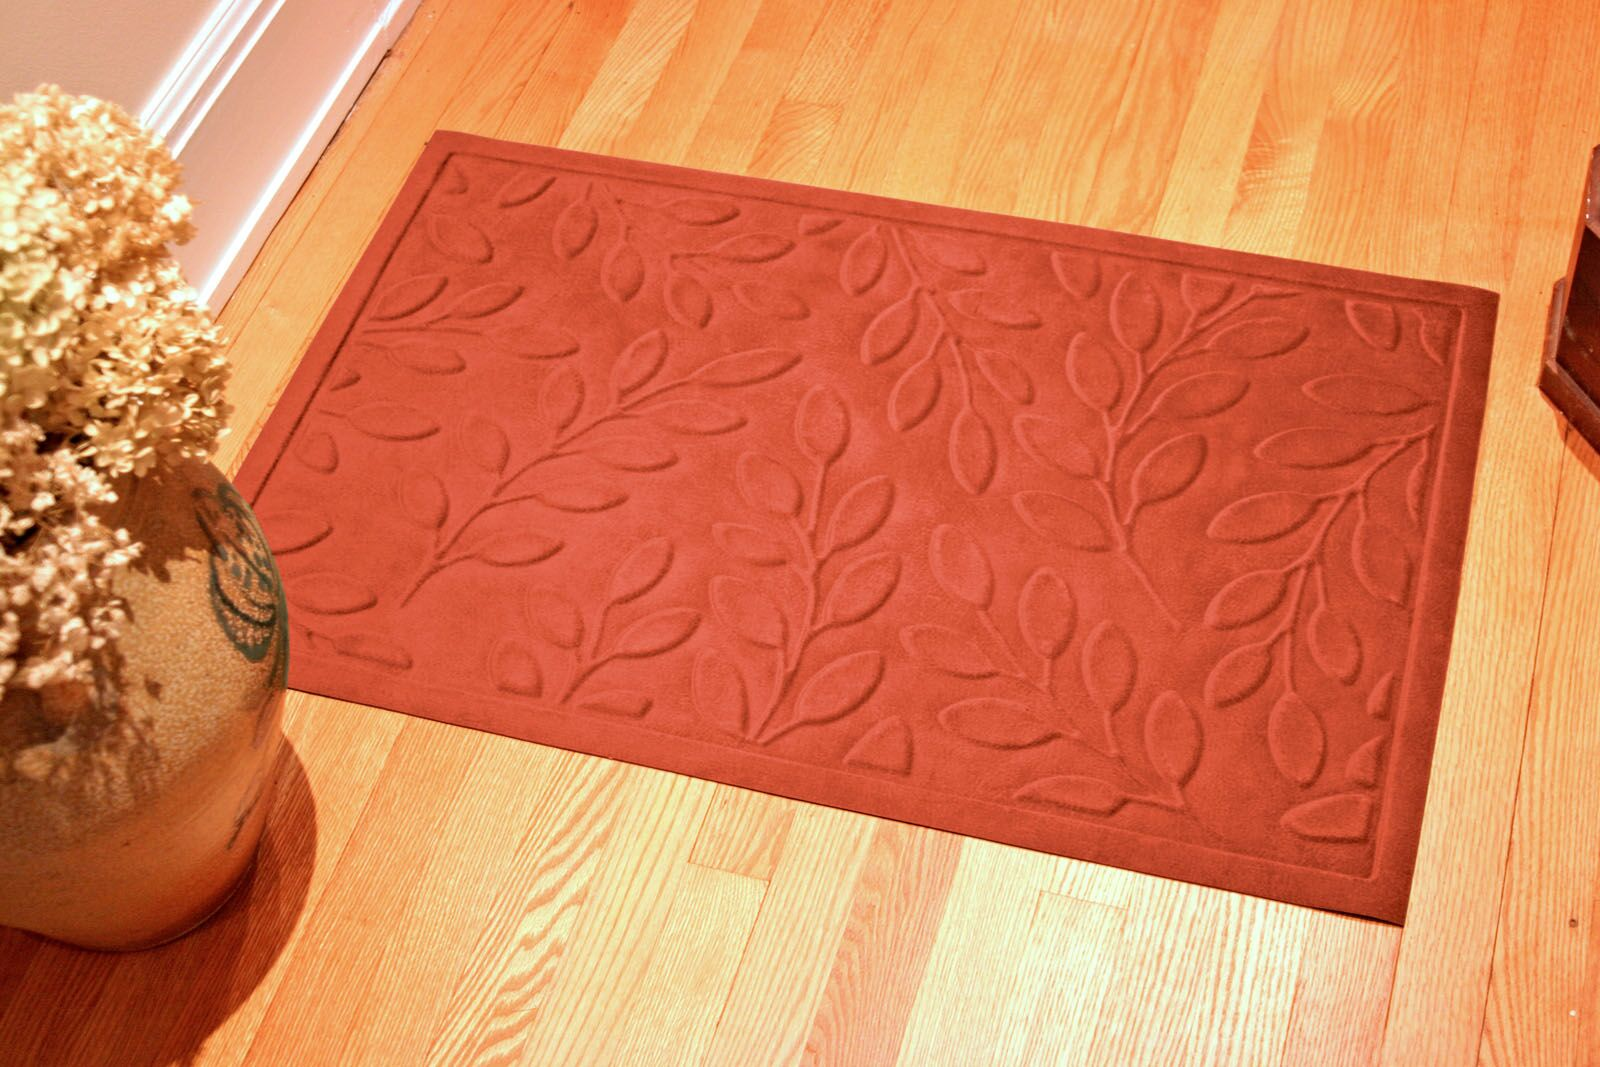 Soft Impressions Britney Leaf Doormat Color: Pepper, Mat Size: Rectangle 3' x 5'